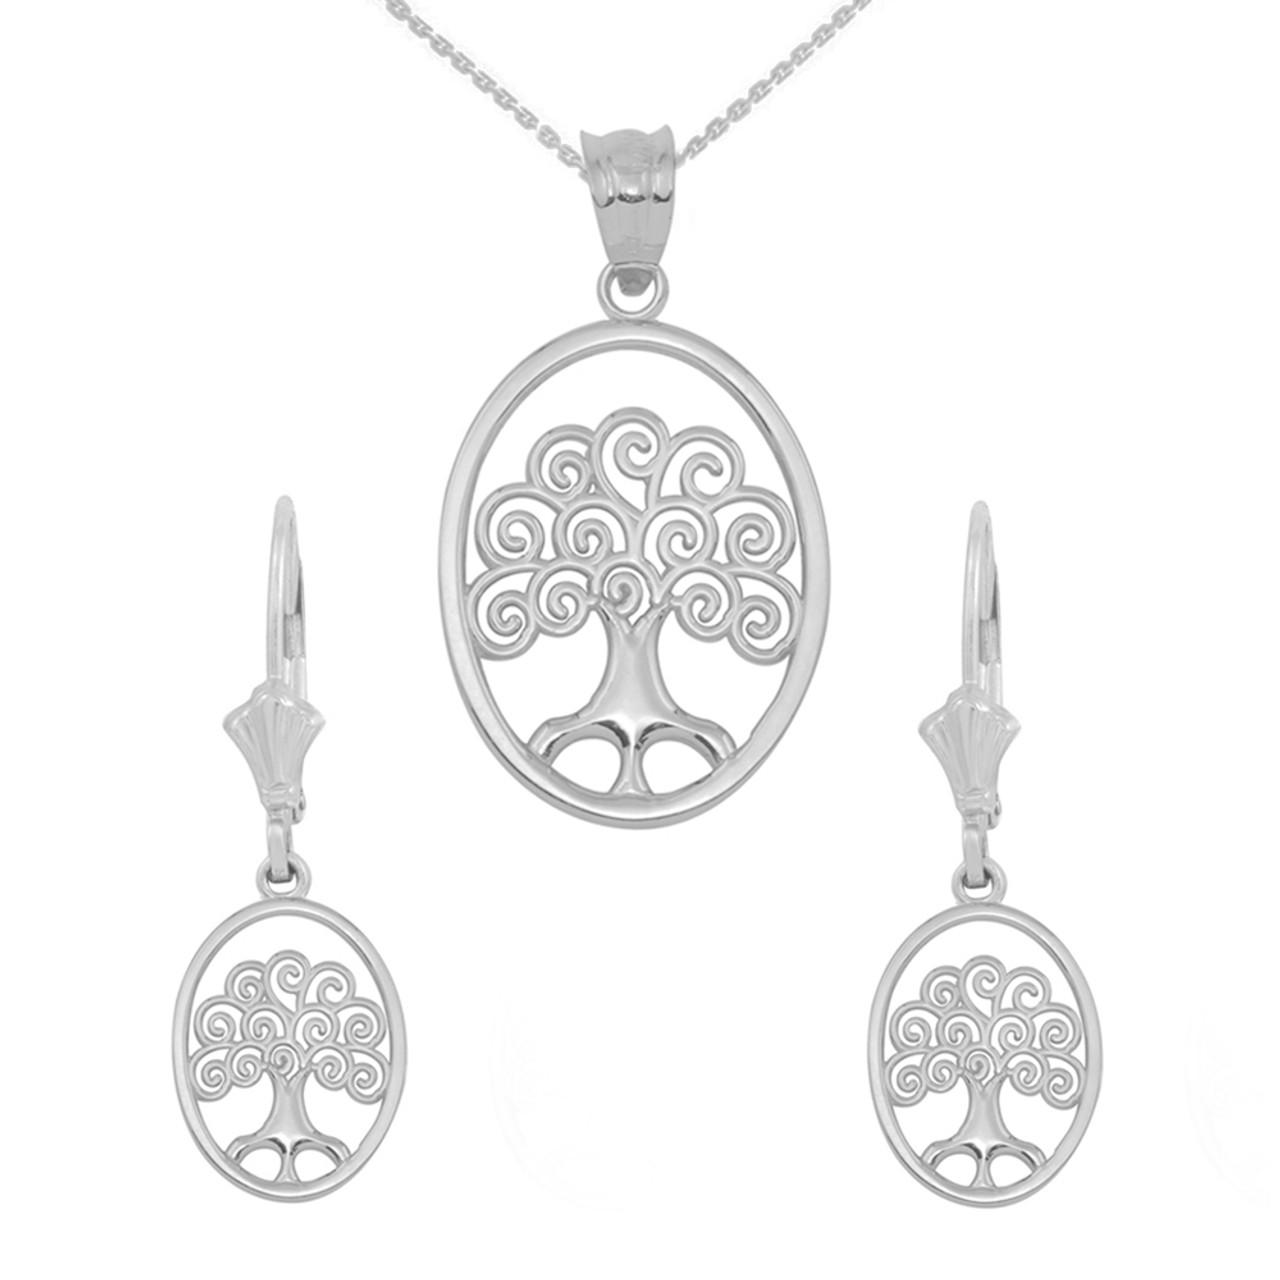 067b1f0bd Sterling Silver Tree of Life Filigree Swirl Celtic Pendant Necklace ...